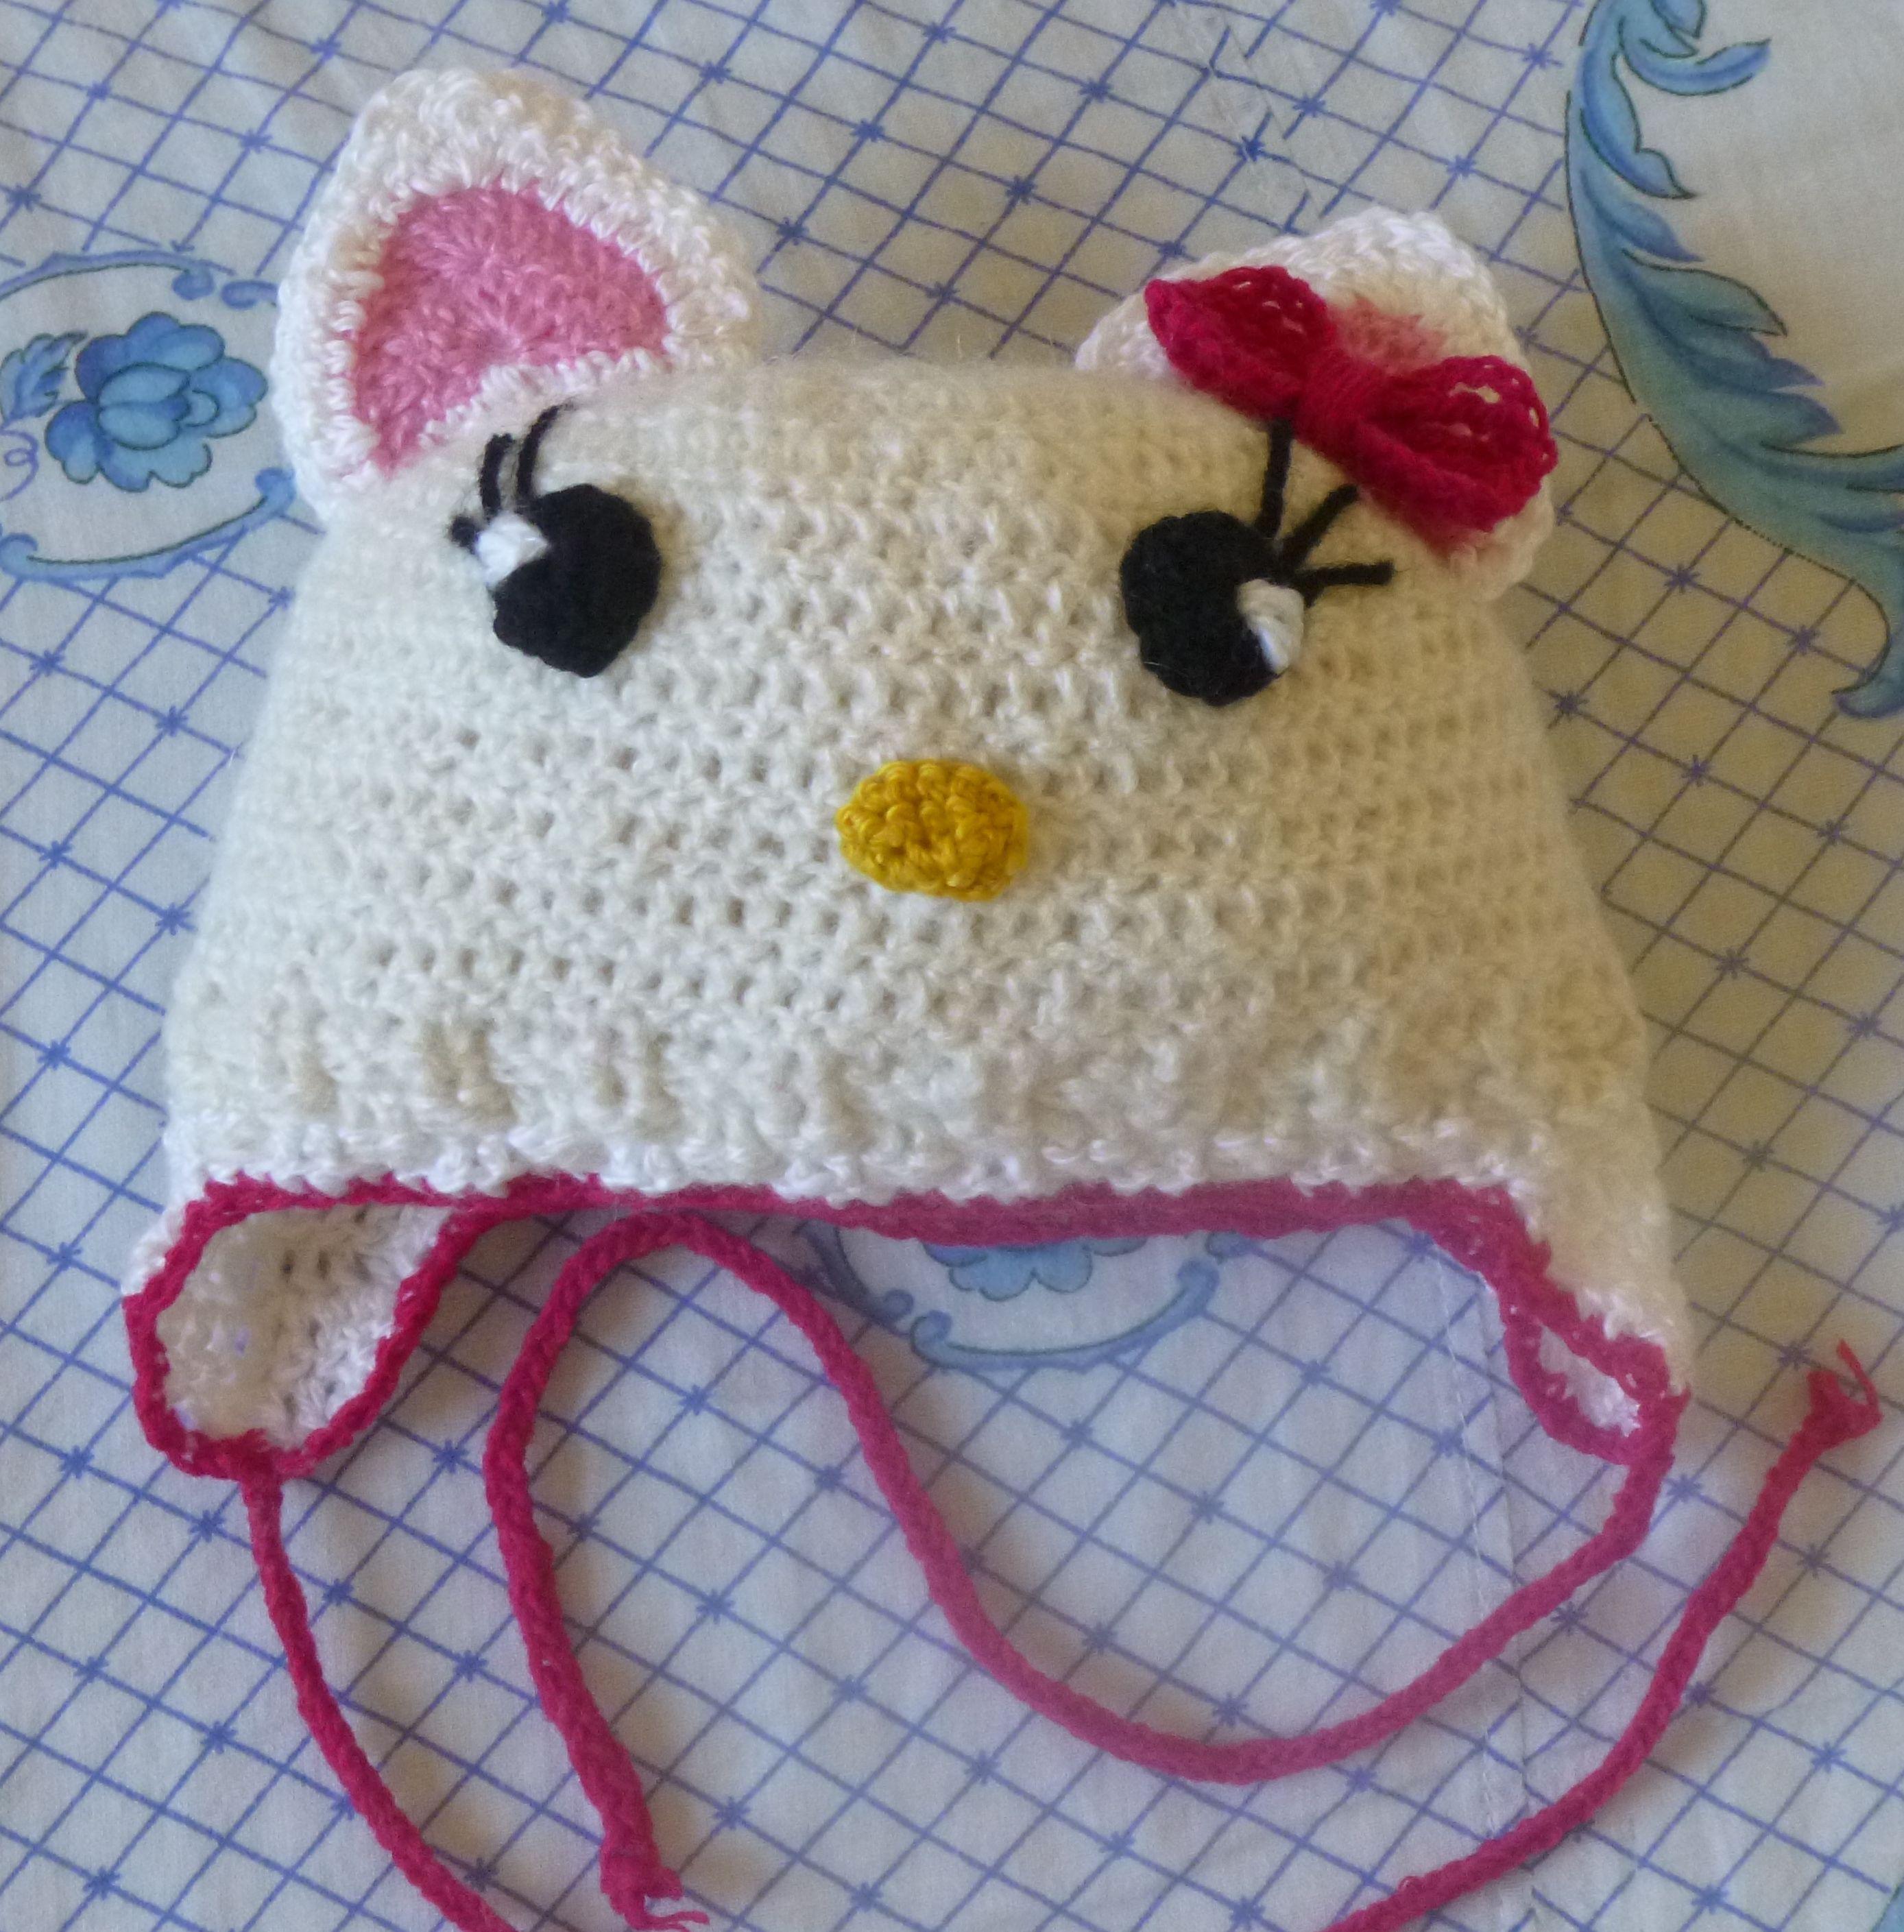 kitty hello шапочкаhellokitty демисезонная детская акрил шерсть весенняя вязаная шапочка зимняя осенняя крючком